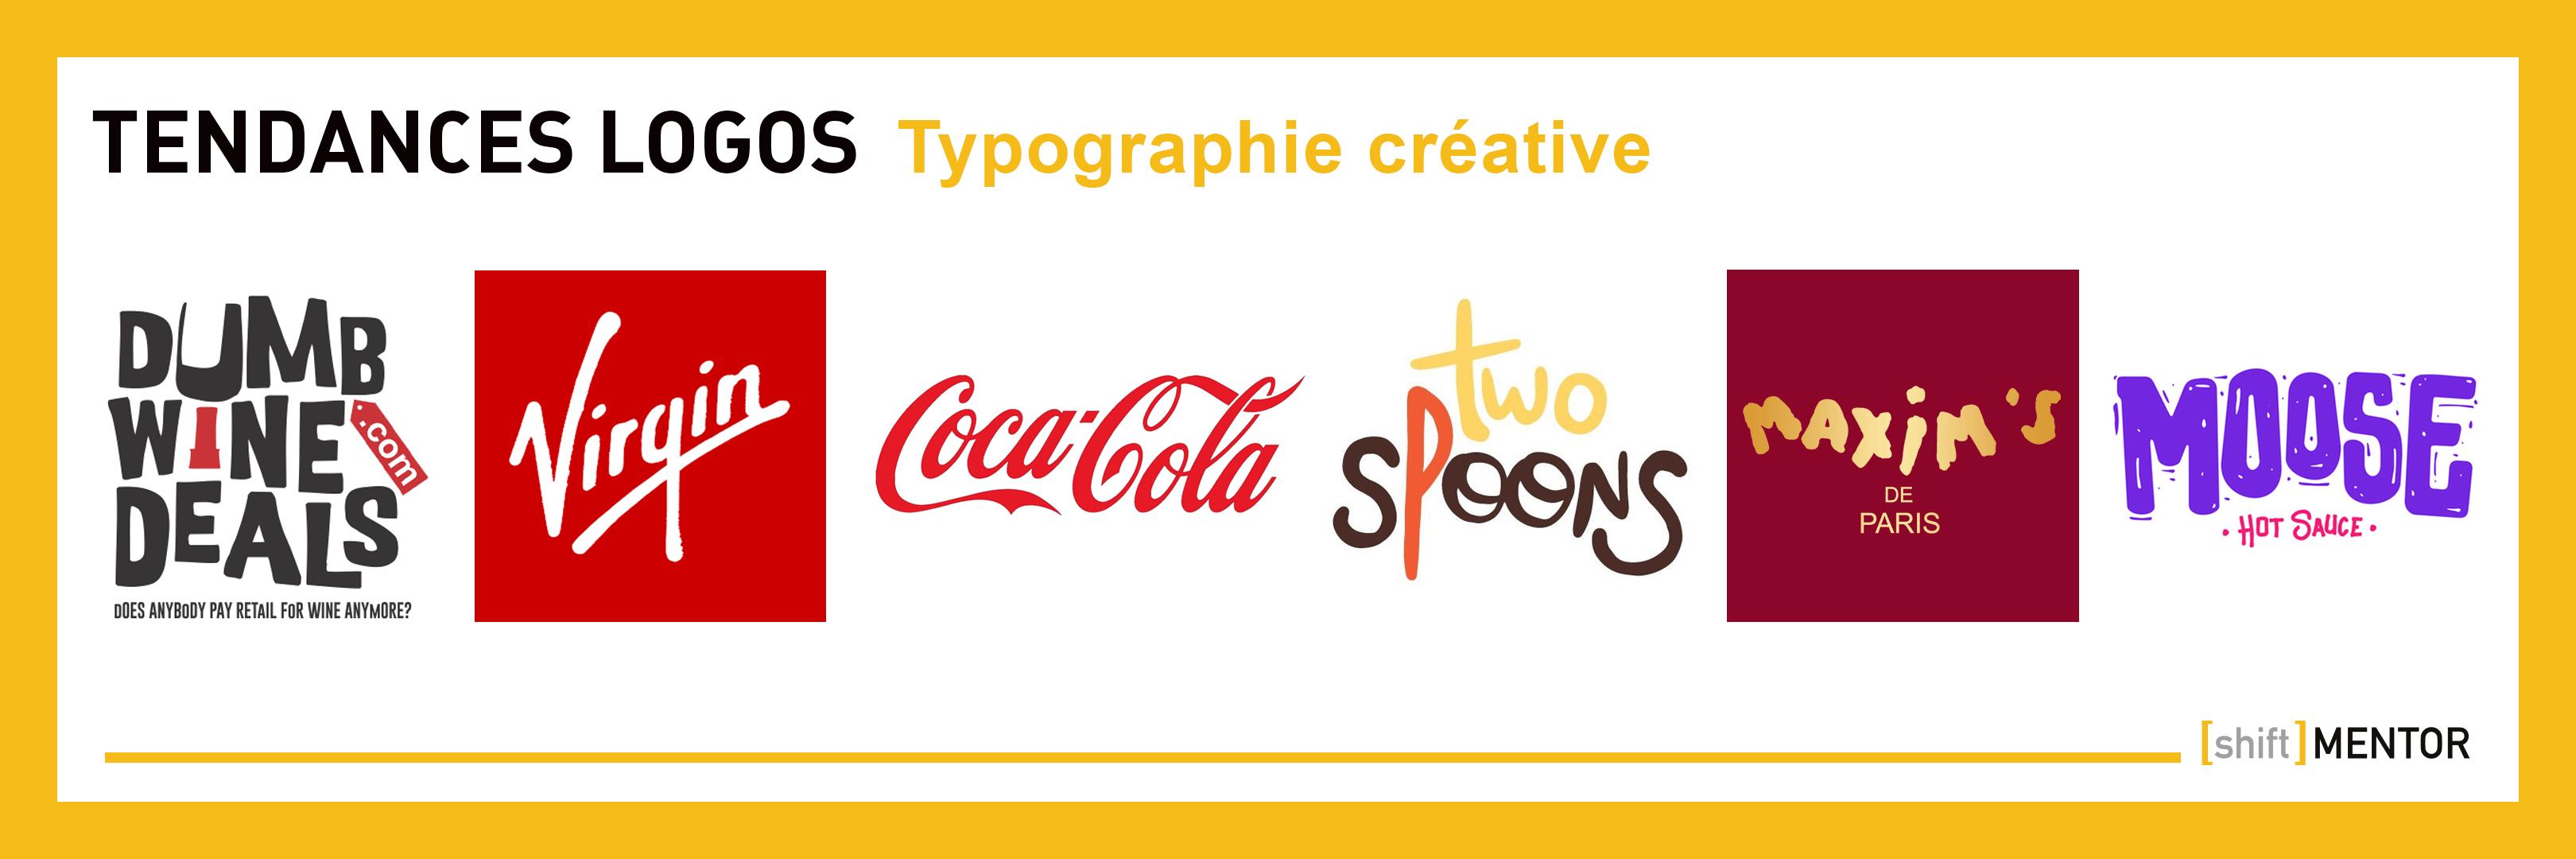 shift mentor trend typographie creative